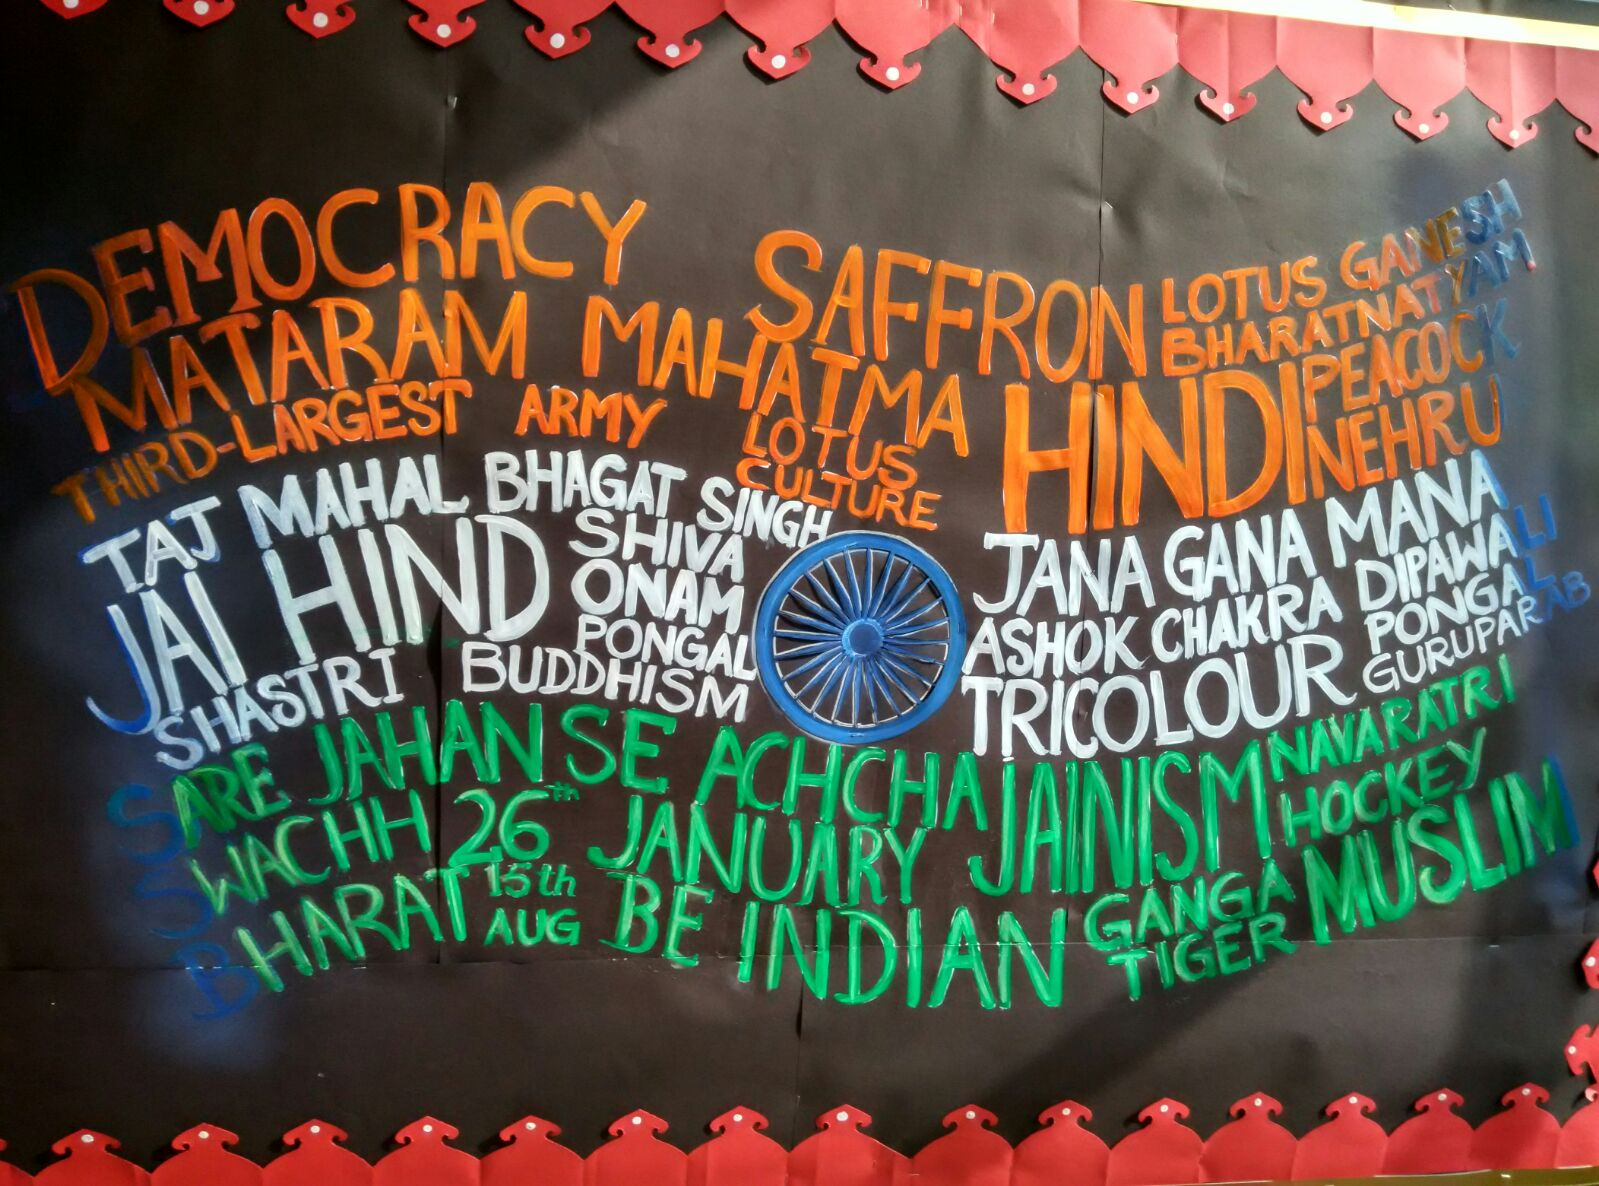 Republic Day Display Board Decoration Ideas For School